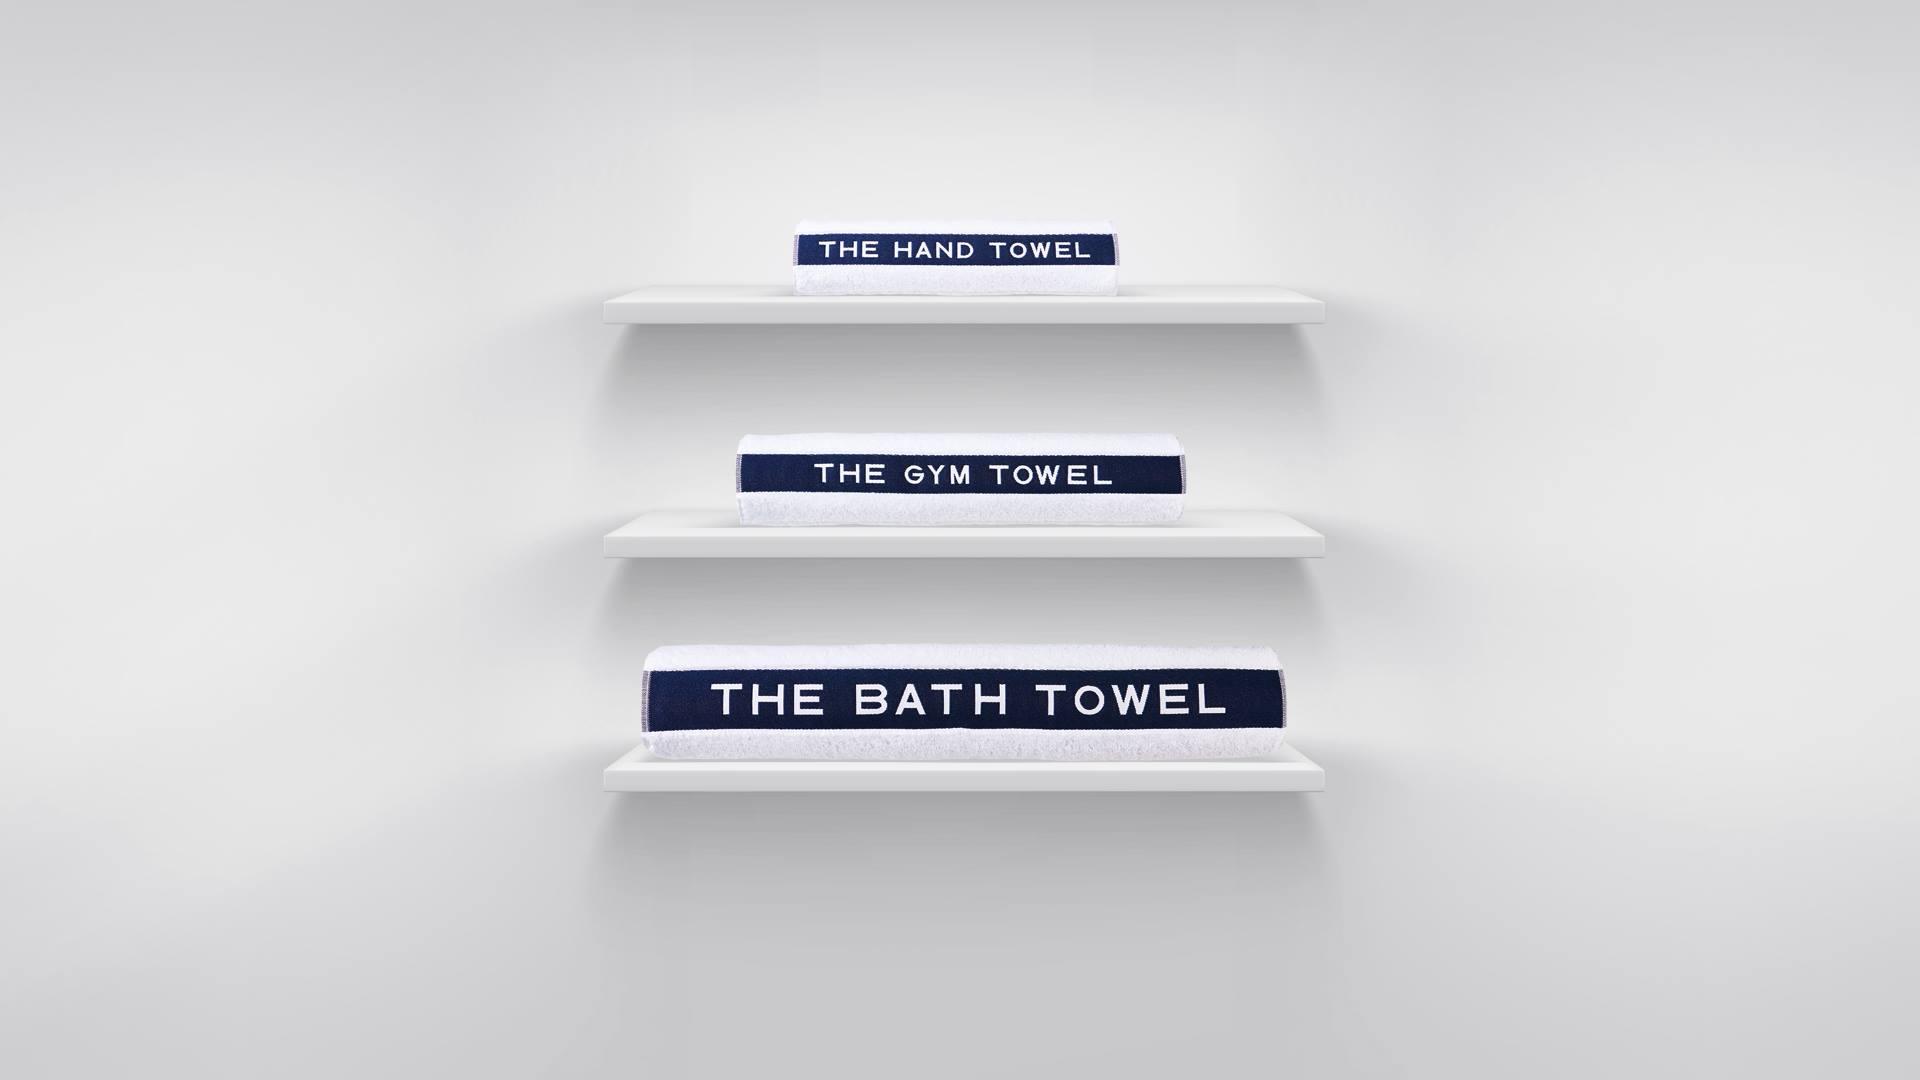 One Purpose. One Towel.